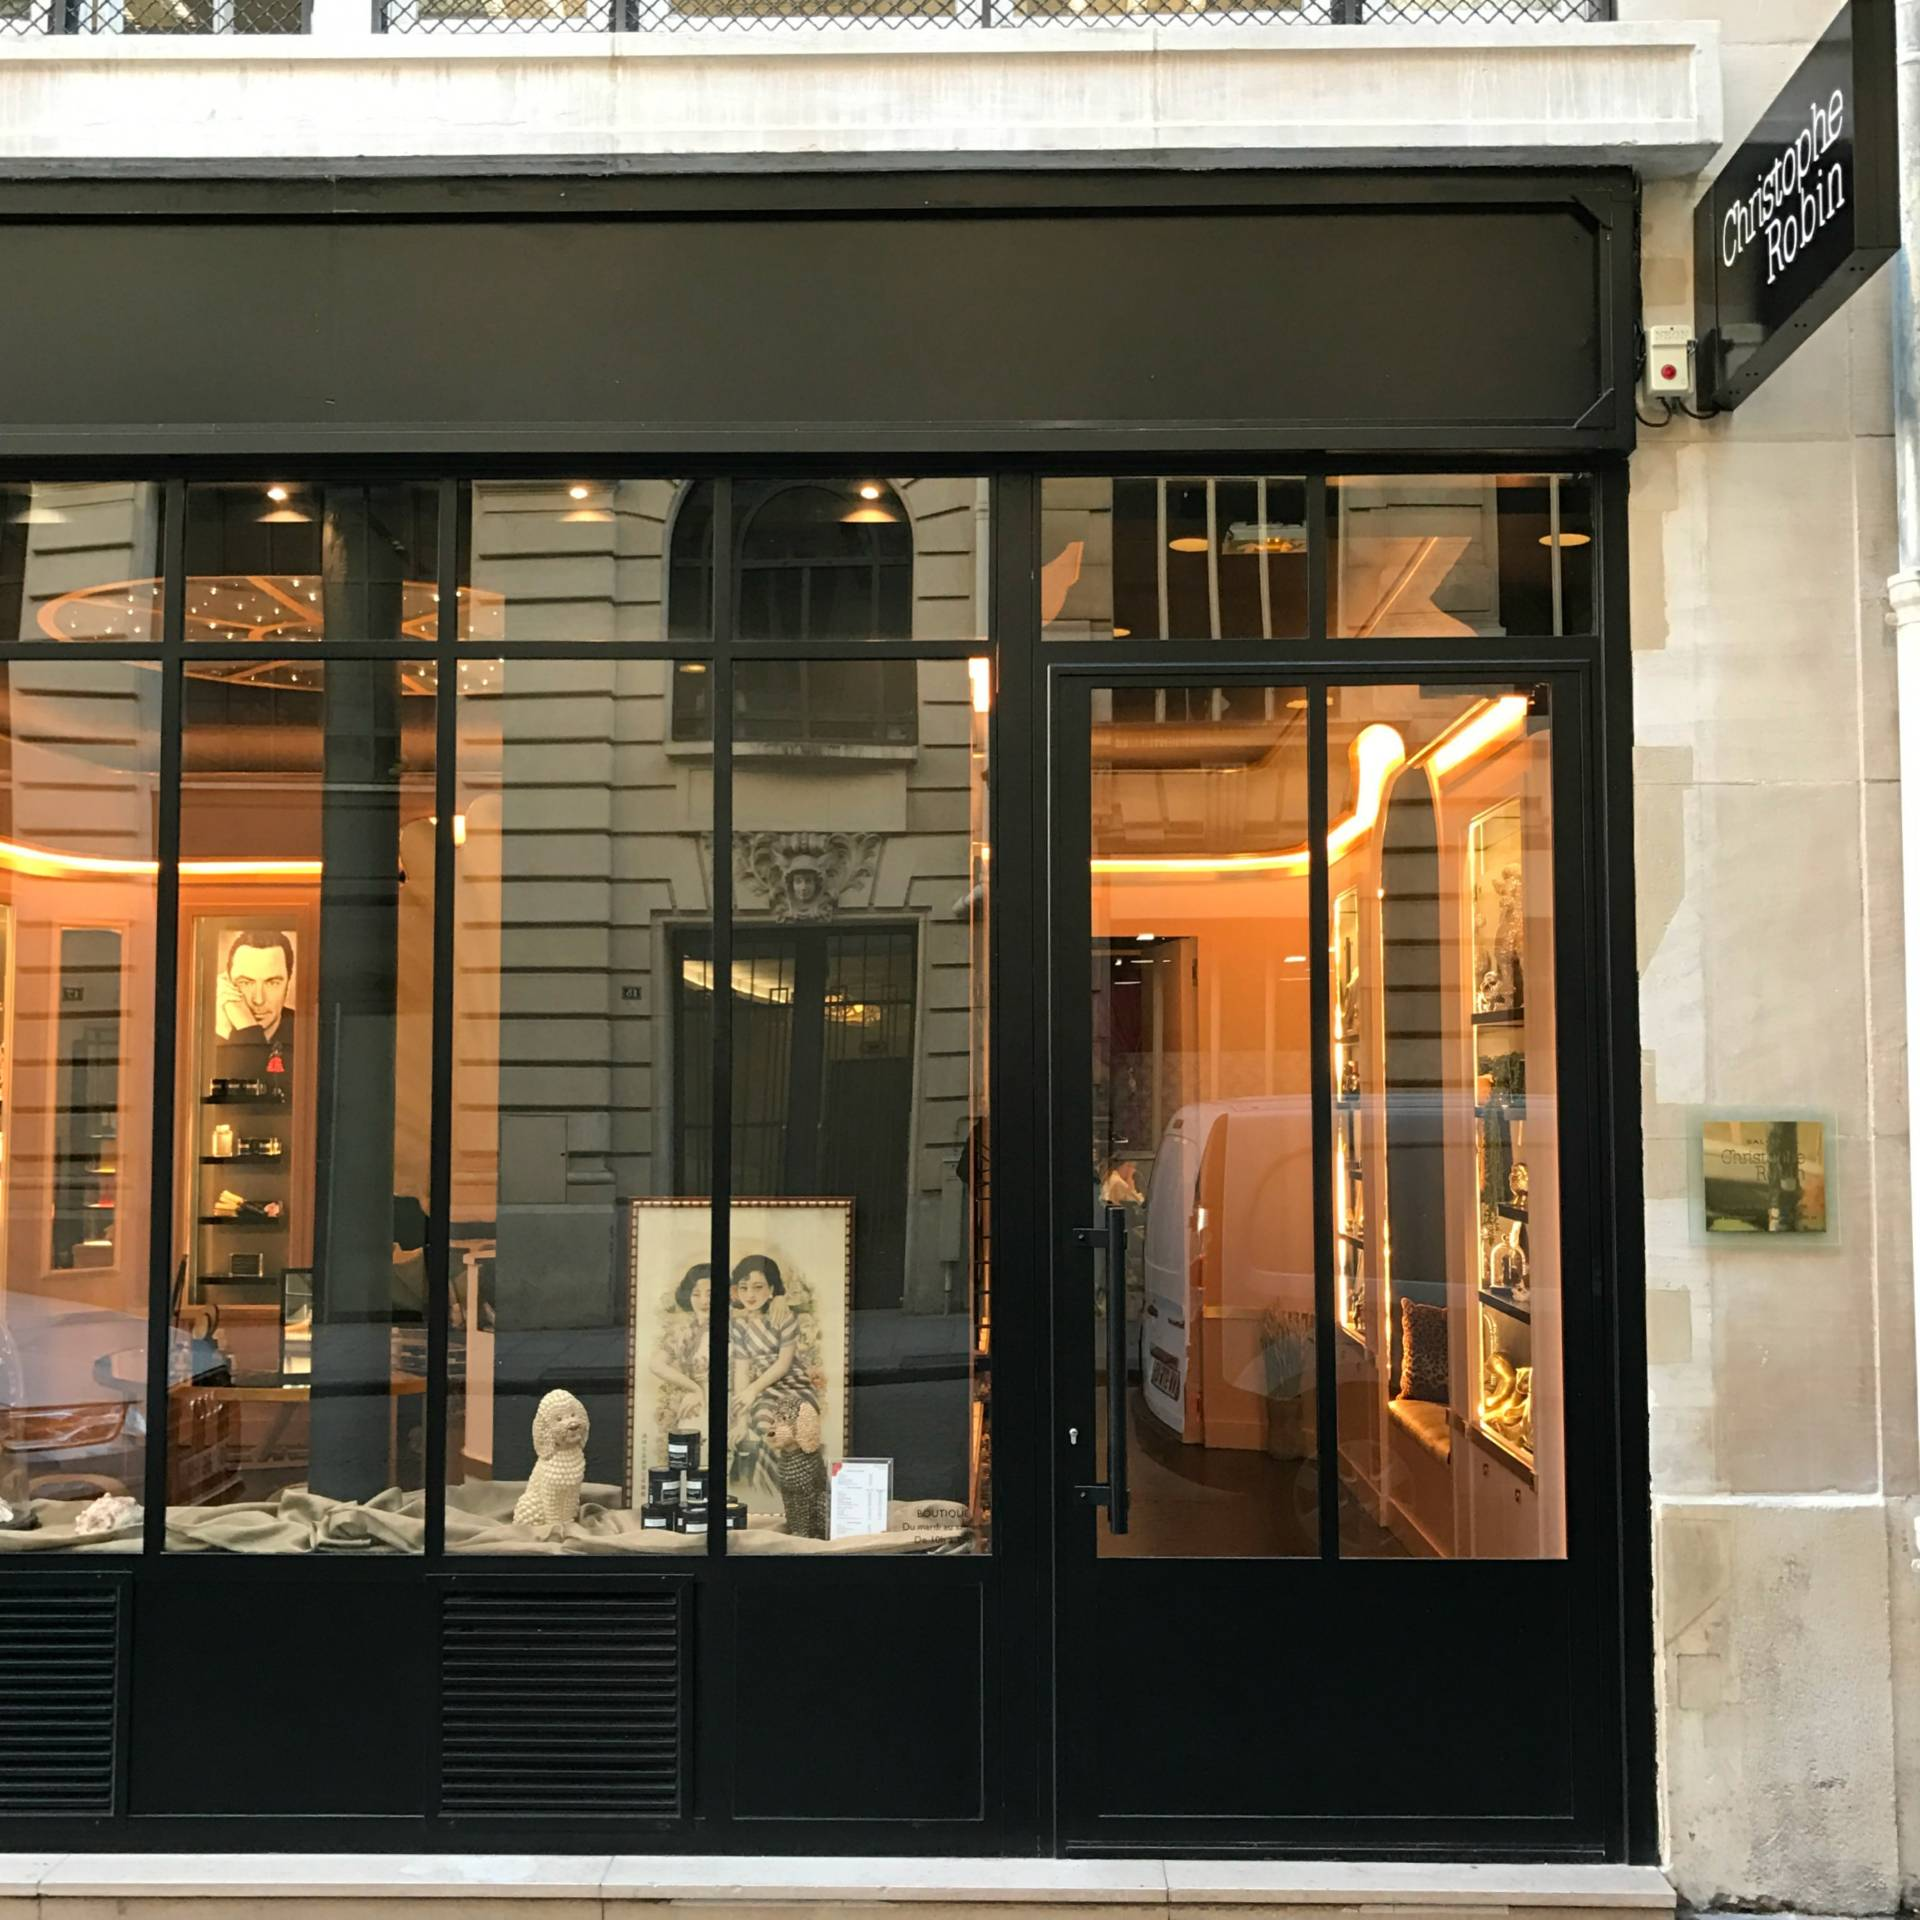 christophe-robin-paris-salon-inhautepursuit-travel-visit